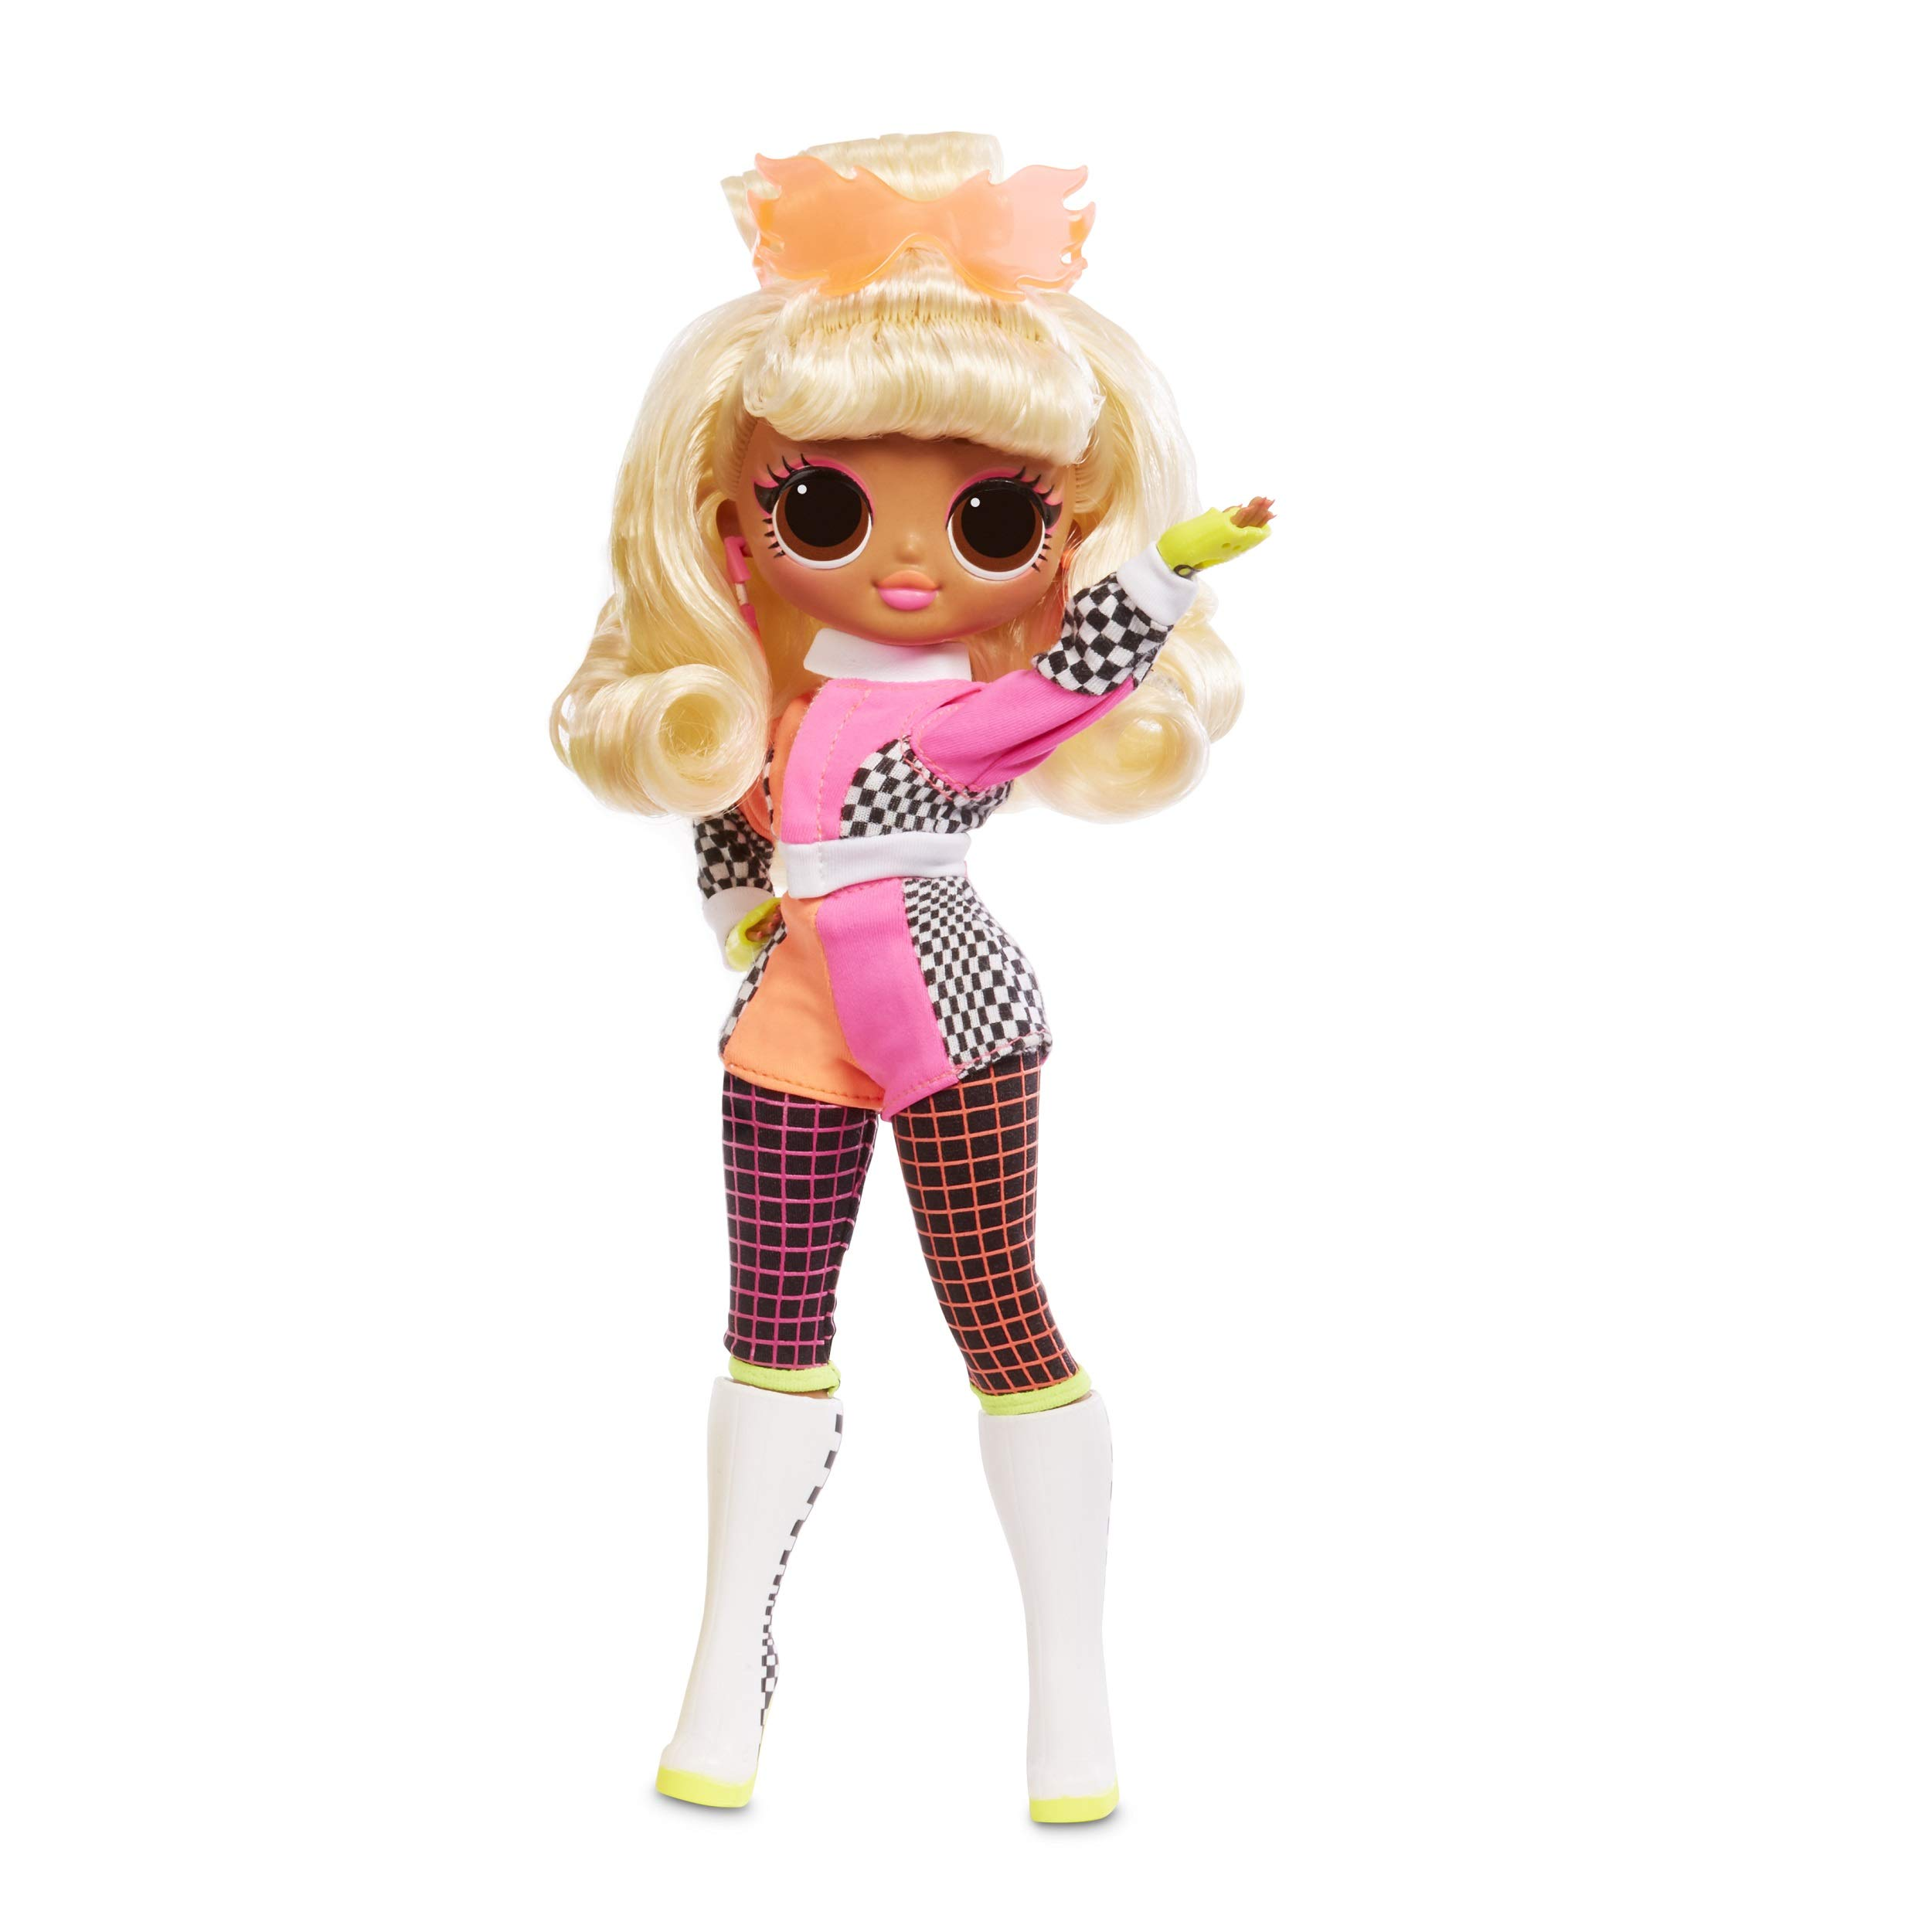 L.O.L. Surprise! O.M.G. Lights Speedster Fashion Doll with 15 Surprises Multicolor